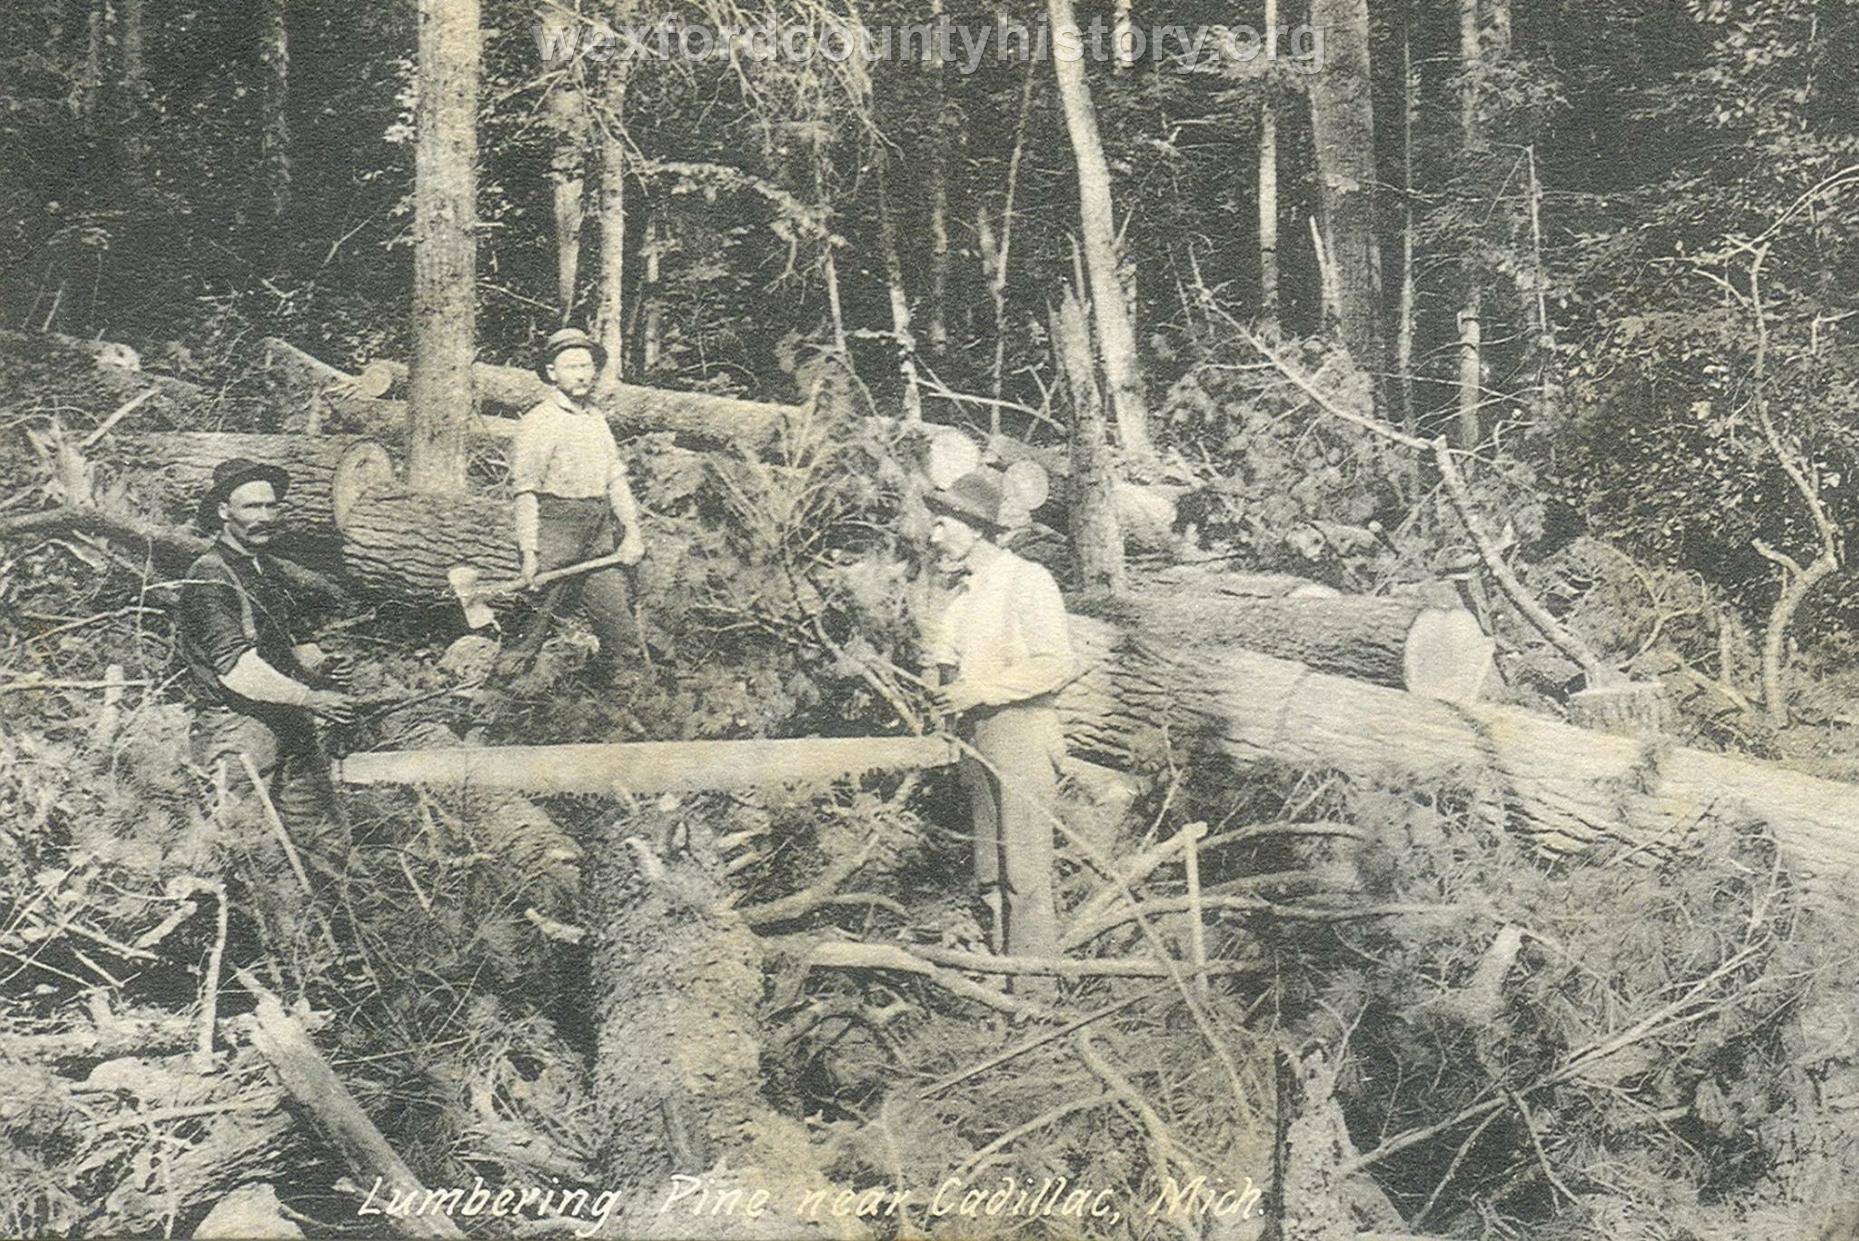 Cadillac-Lumber-Lumbering-Pine-Near-Cadillac-Michigan